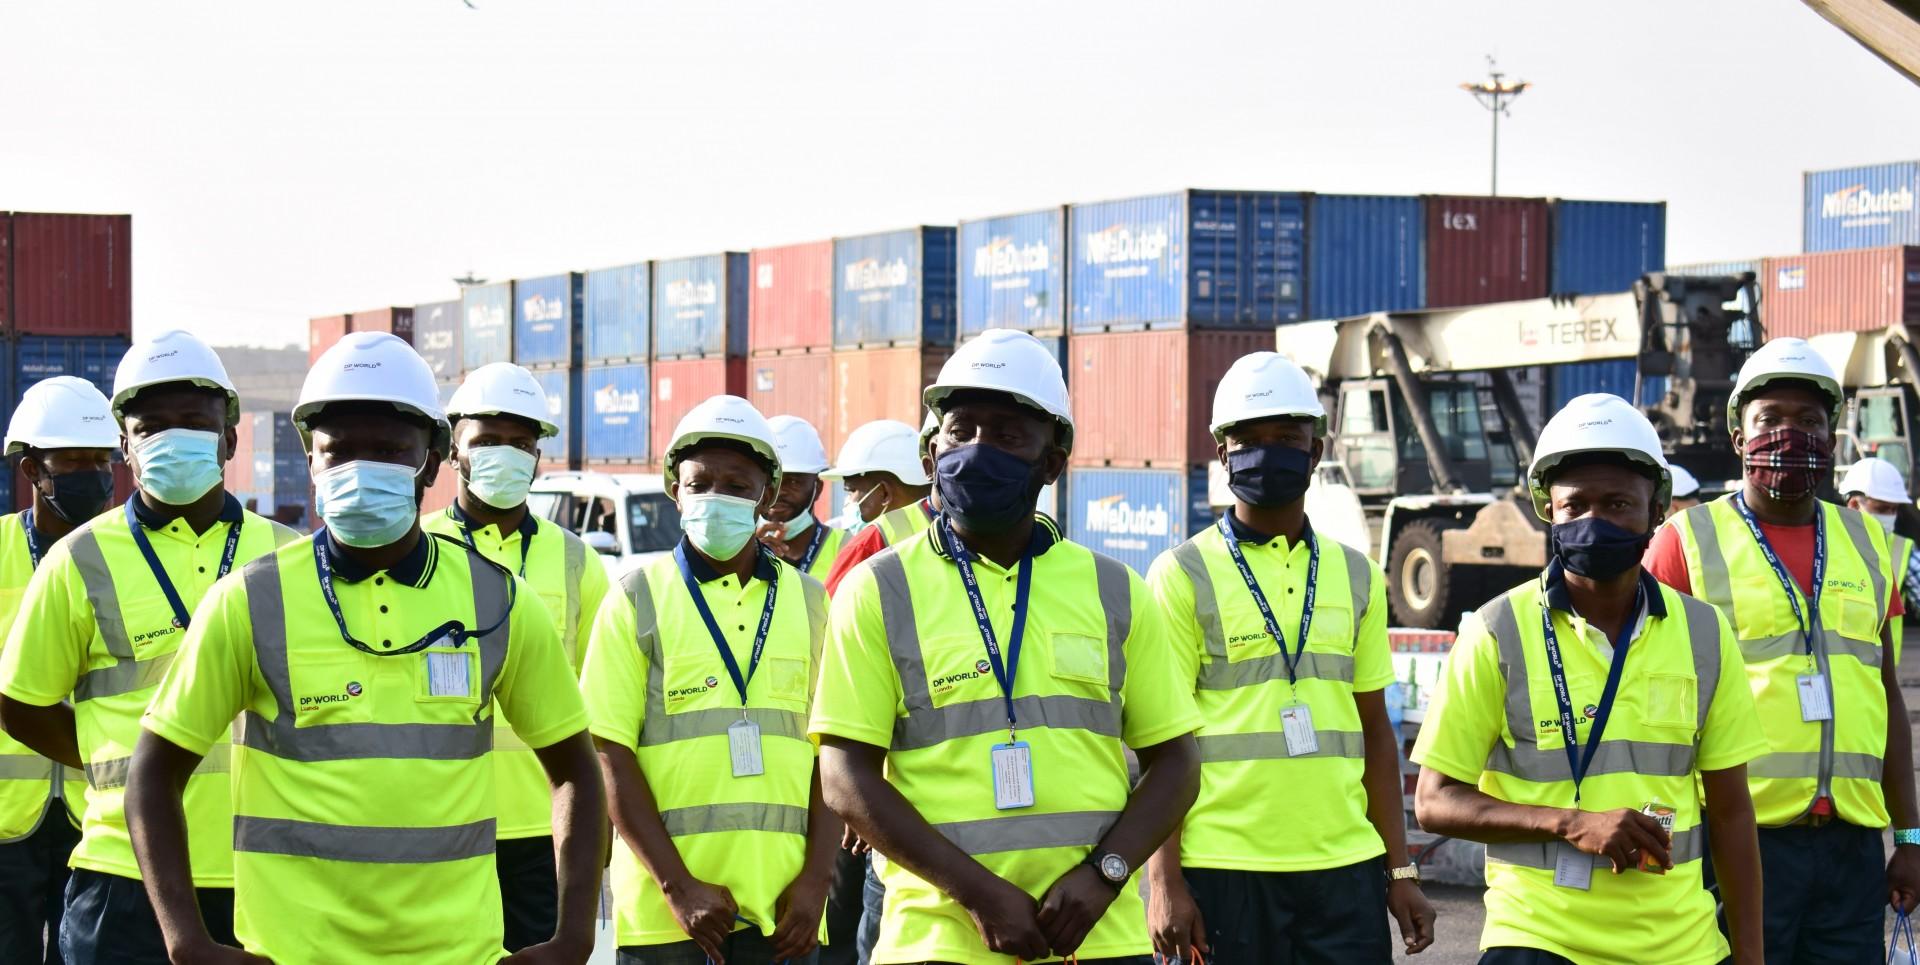 DP World starts operations of multipurpose terminal at Port of Luanda